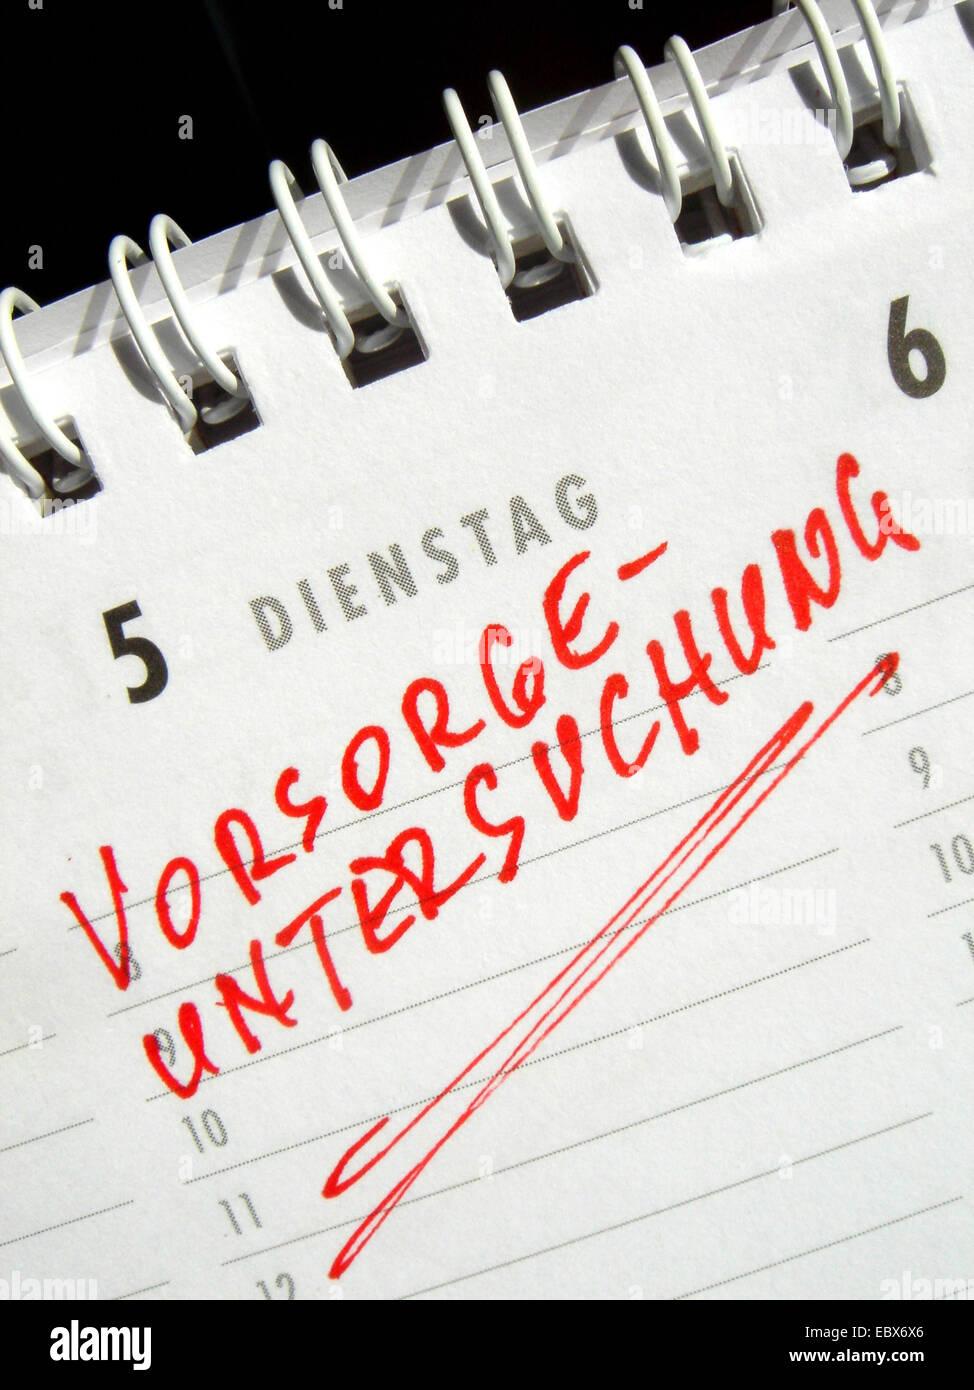 Preventive medical examination - calendar entry - Stock Image